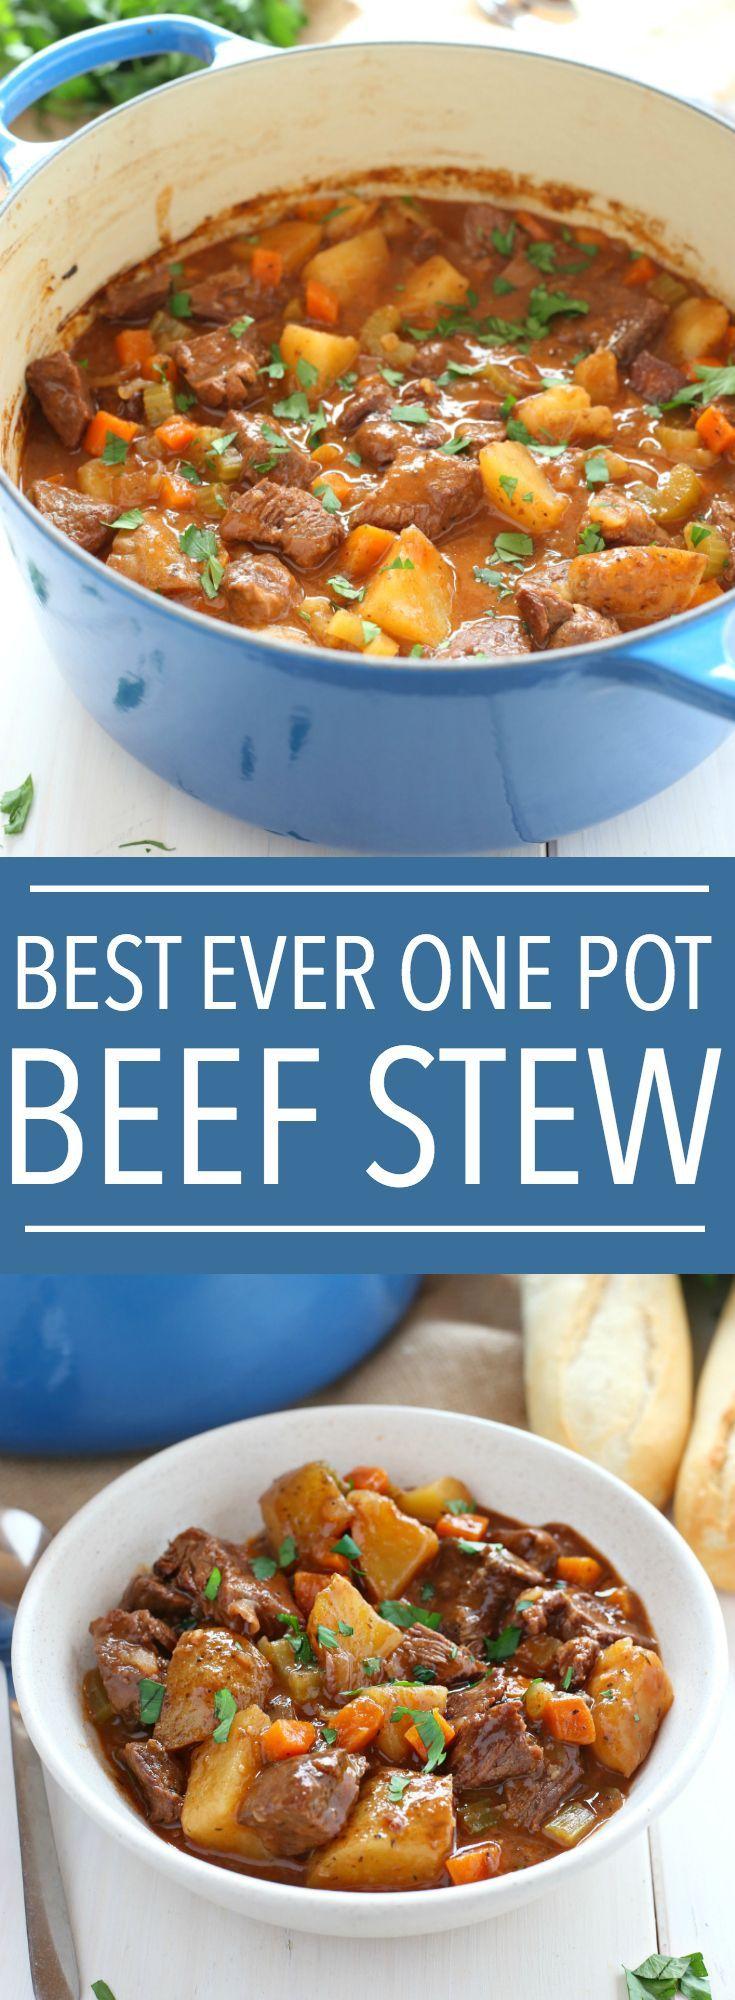 Best Ever One Pot Beef Stew Recipe Classic Beef Stew Recipe Beef Stew Recipe Stew Recipes